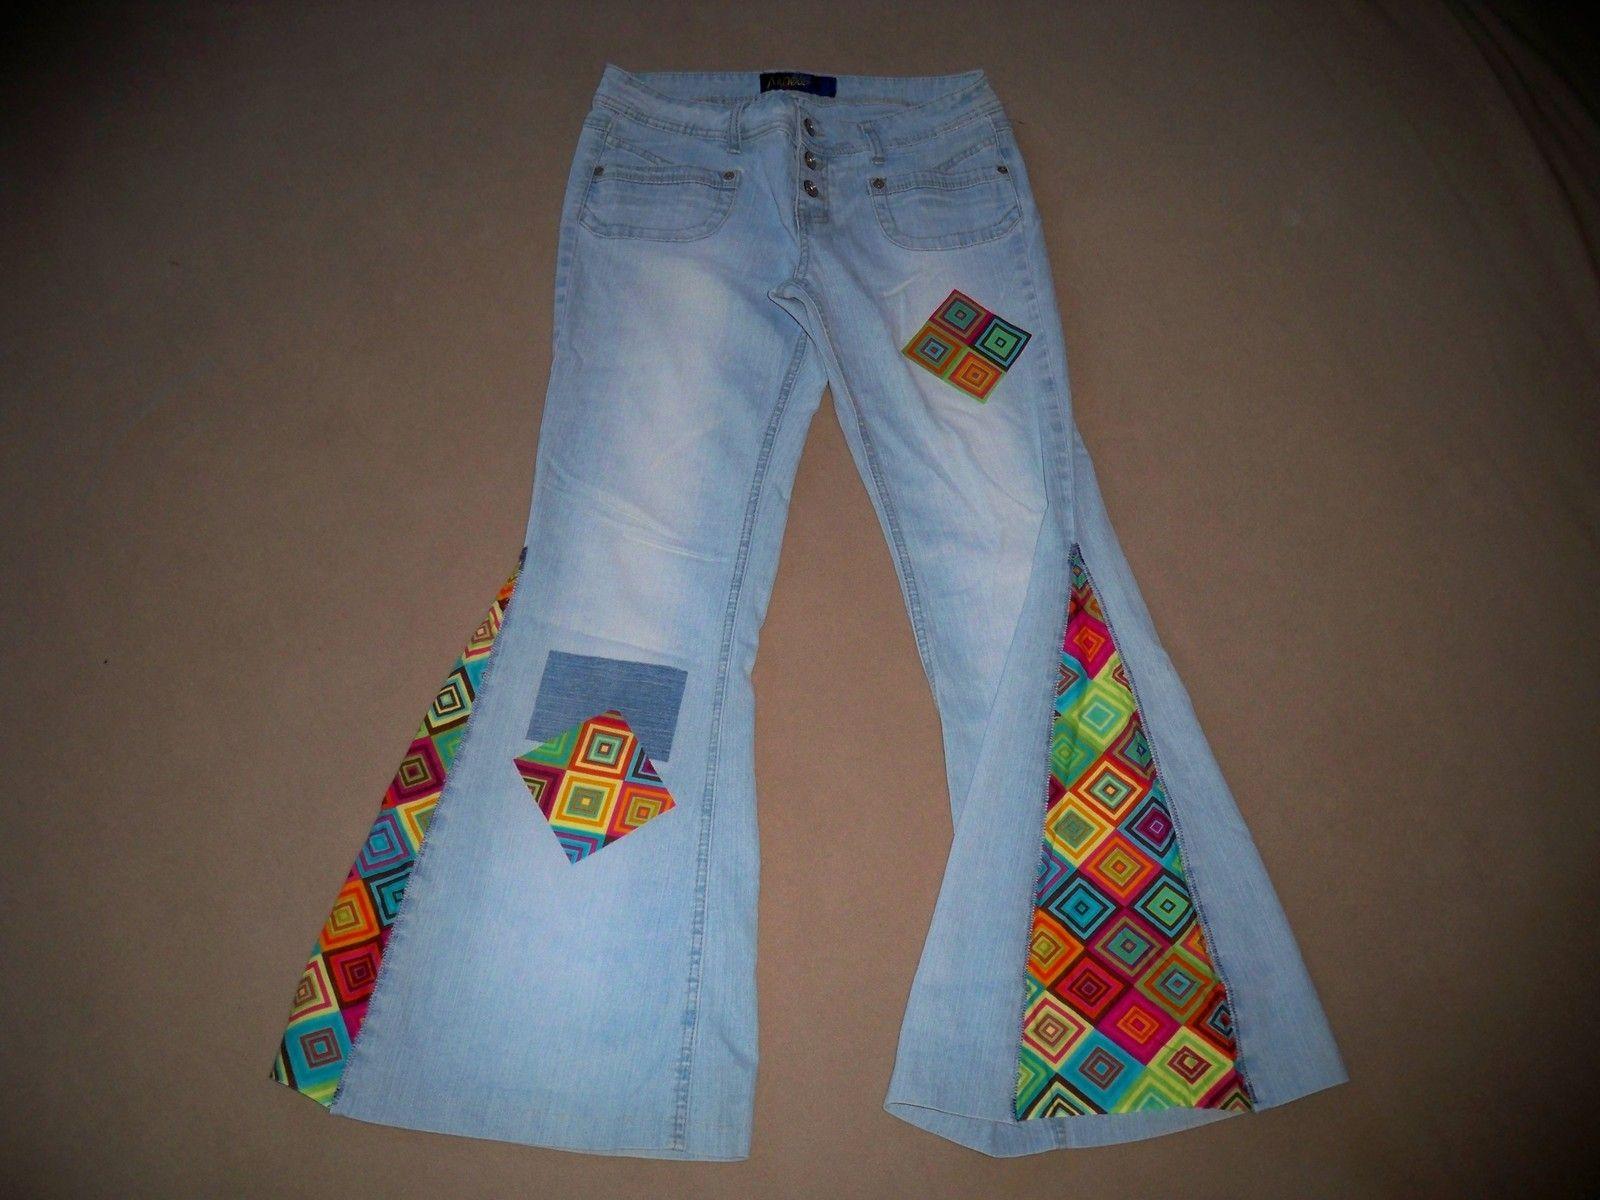 Diy Hippie Jeans No Link 70s Costume Diy Hippie Costume Diy Hippie Diy